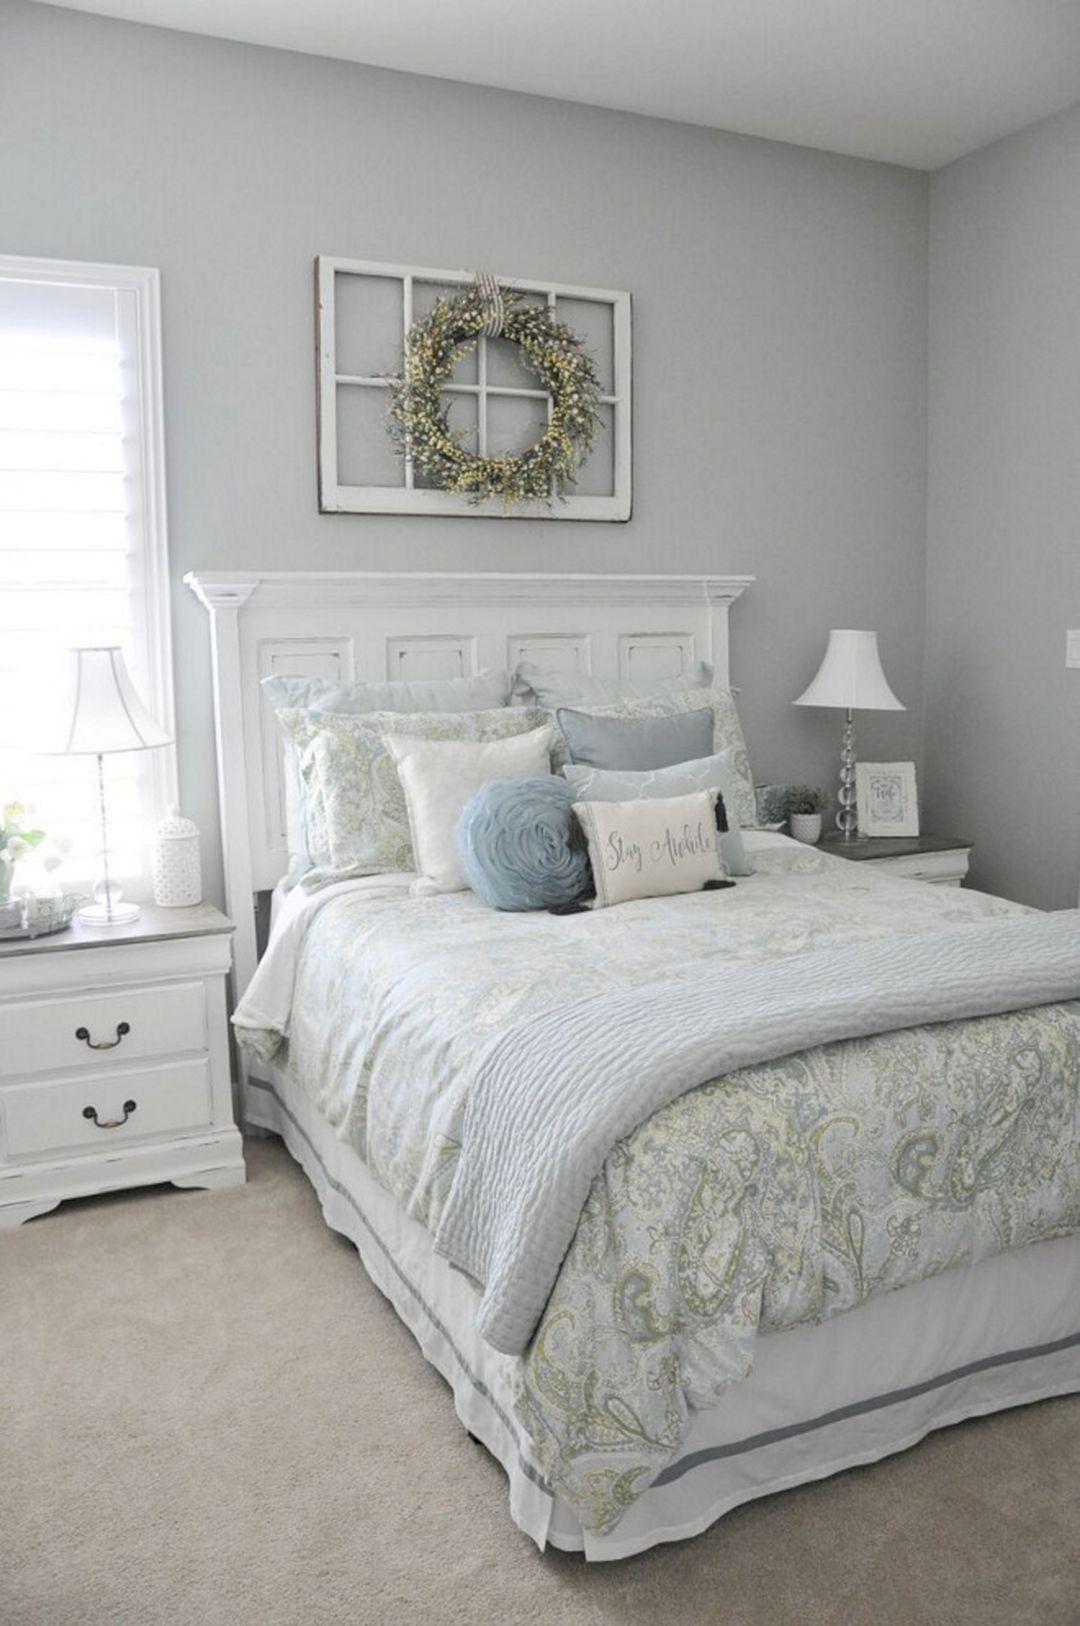 121 Incredible Guest Bedroom Design Ideas 123